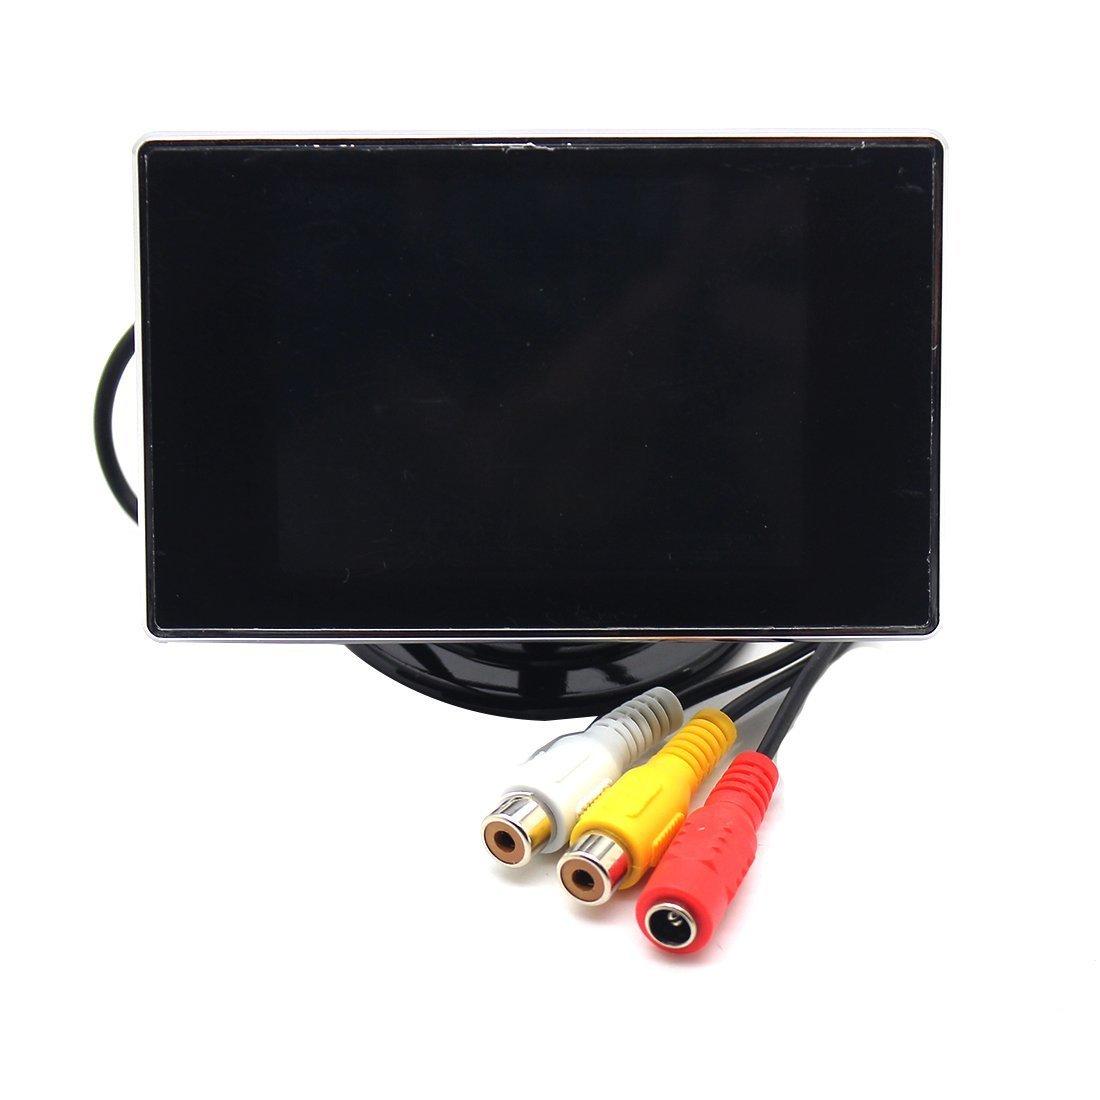 3.5 TFT LCD Monitor de Cá mara de marcha atrá s retrovisor digital profesional Aparcamiento Back Up Auto Reverse Luwu-Store 3217119